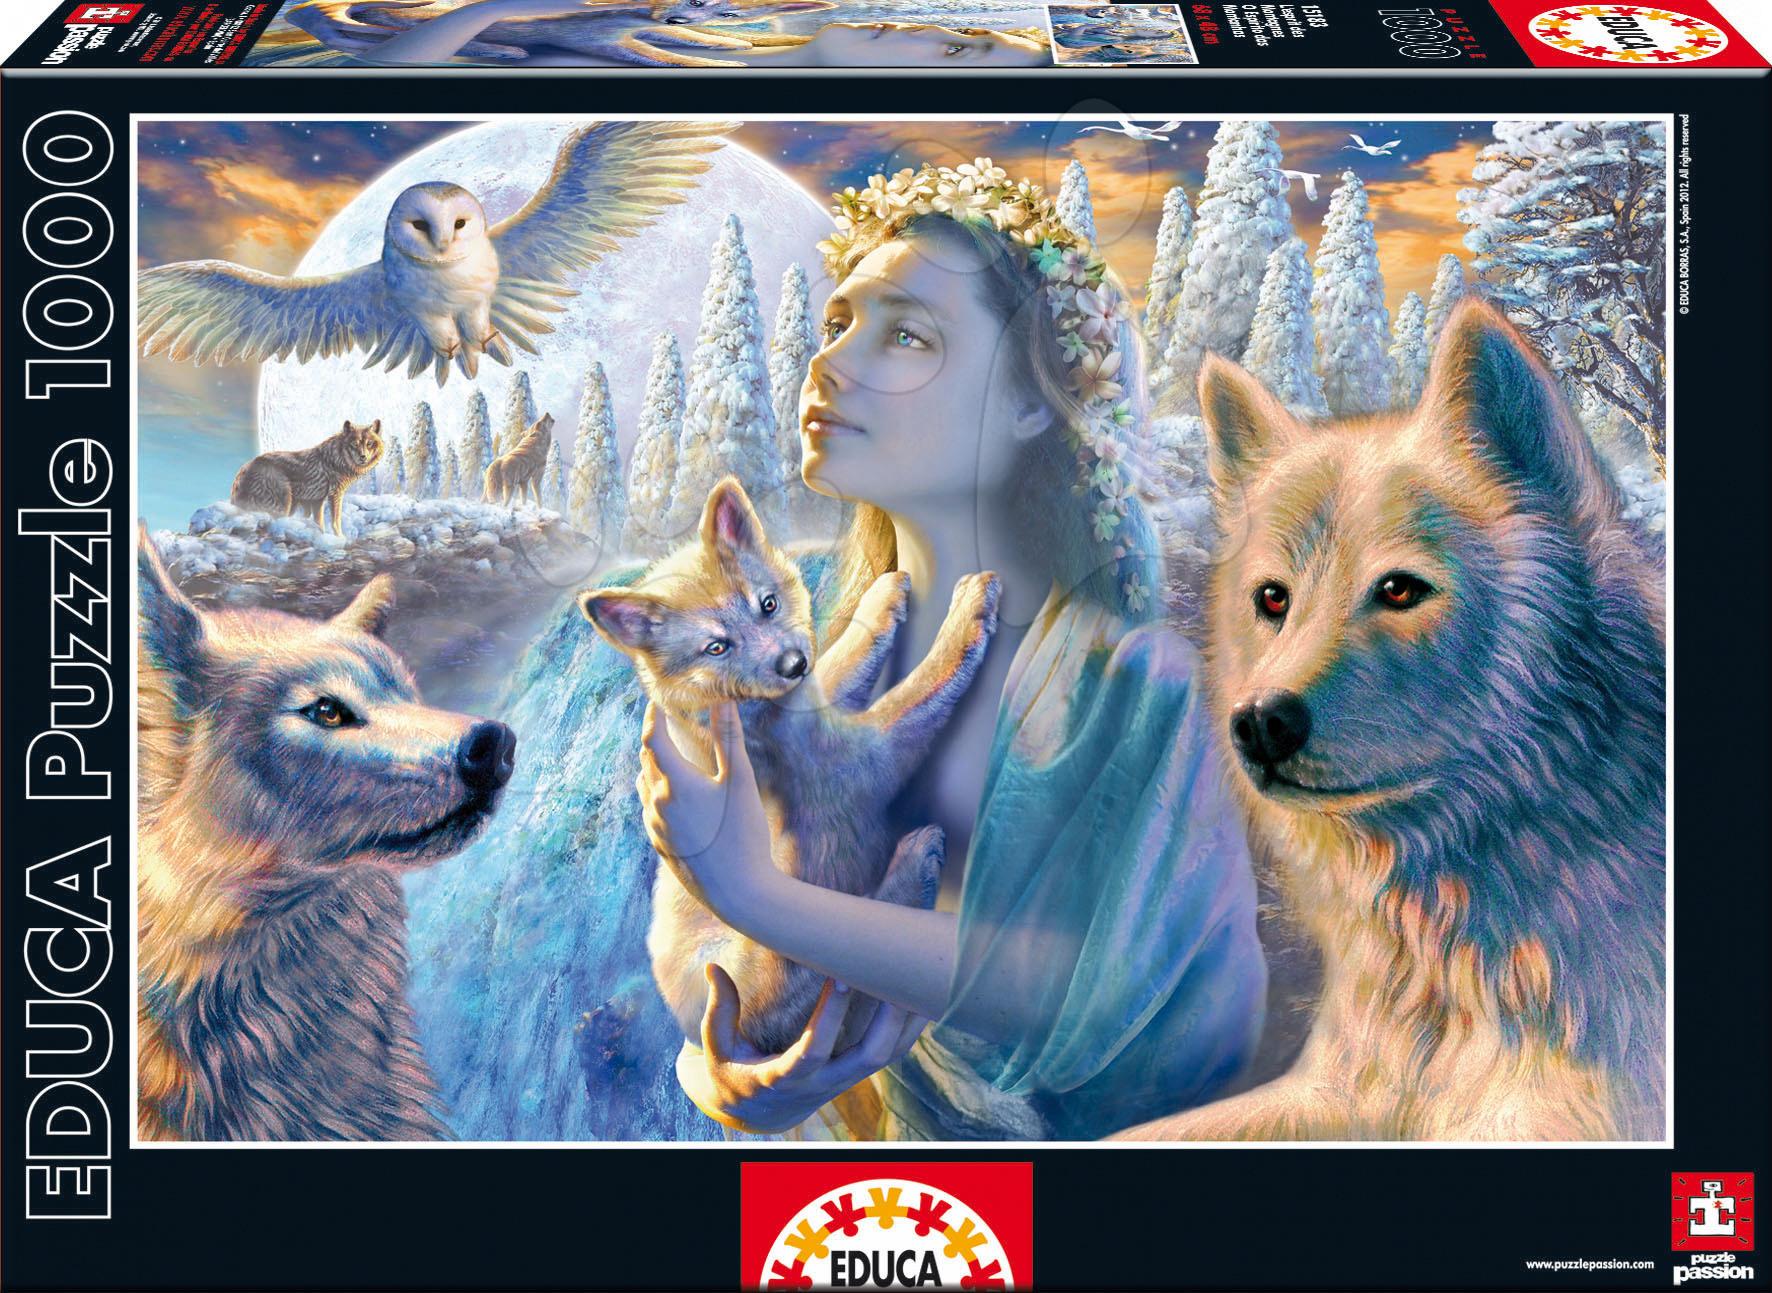 Puzzle 1000 dielne - Puzzle Spirit Of The Mountains Educa 1000 dielov od 12 rokov